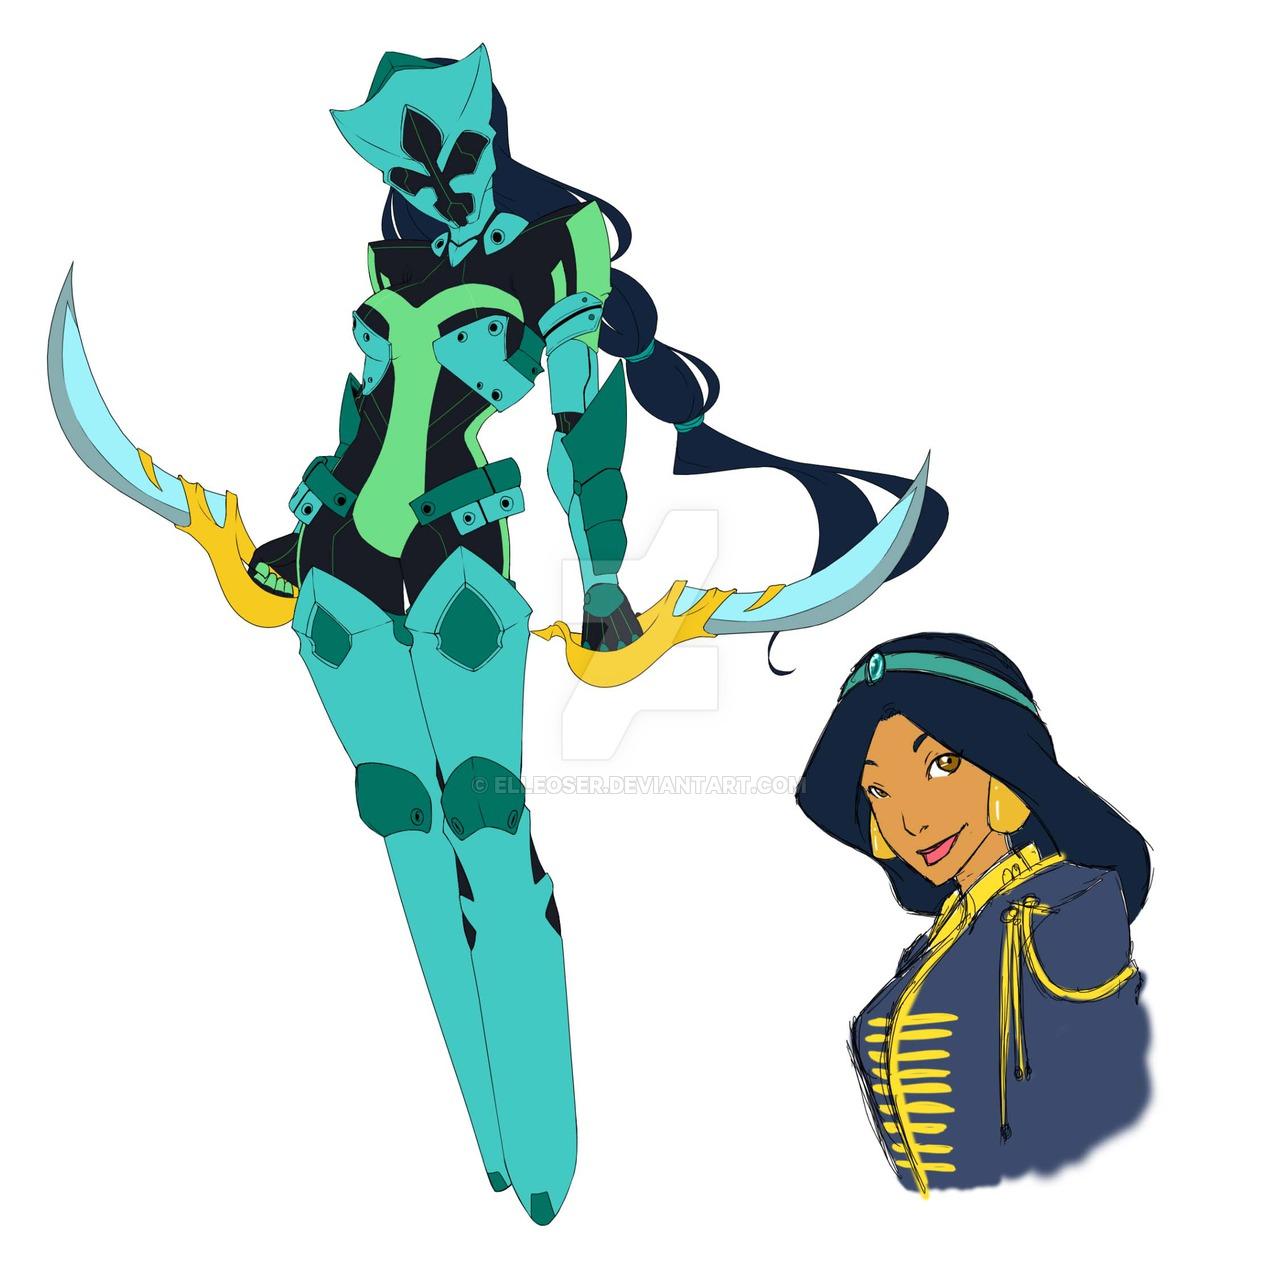 Battle Suit Jasmine by elleoser on DeviantArt.